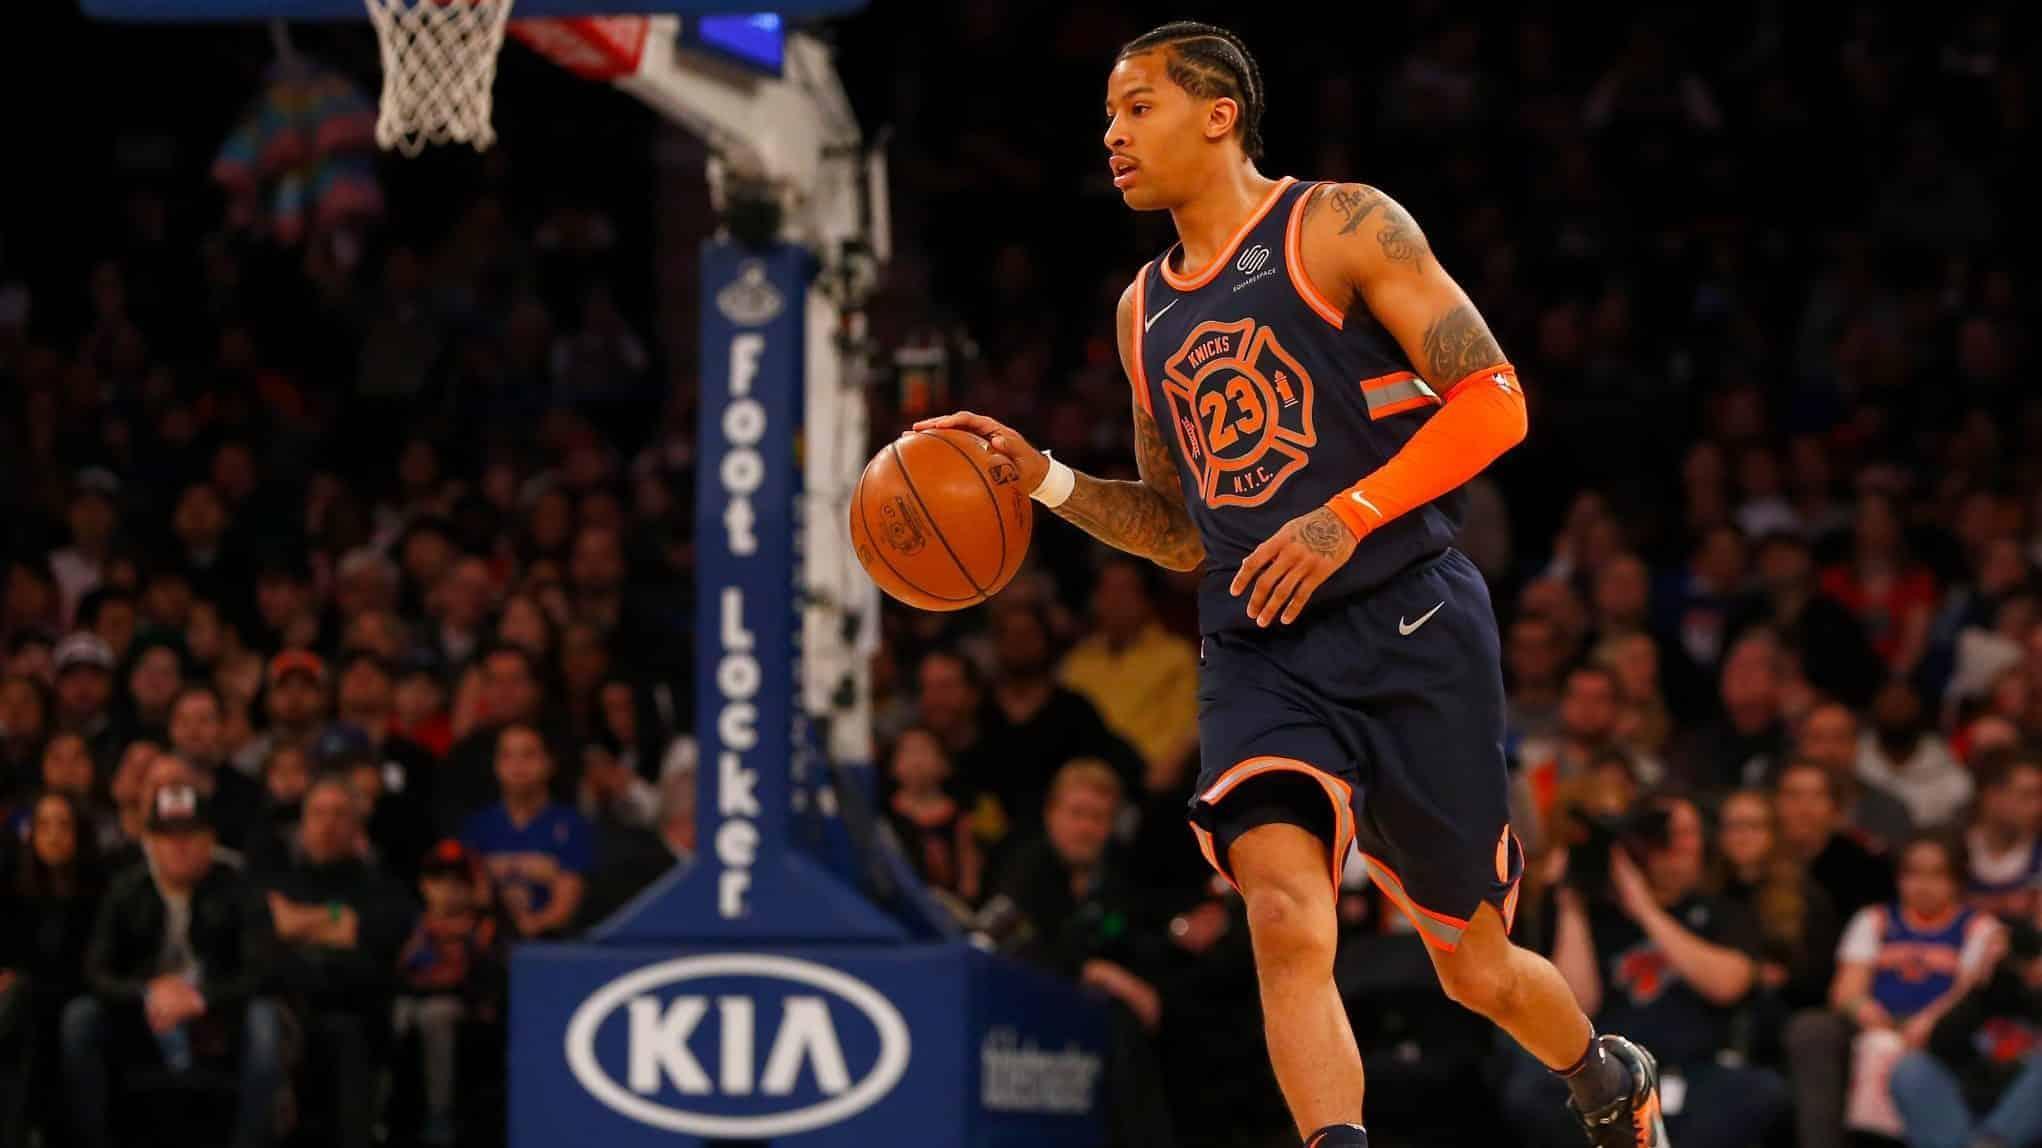 timeless design 79ec9 7f635 New York Knicks 2018-19 Expectations: The returning ...